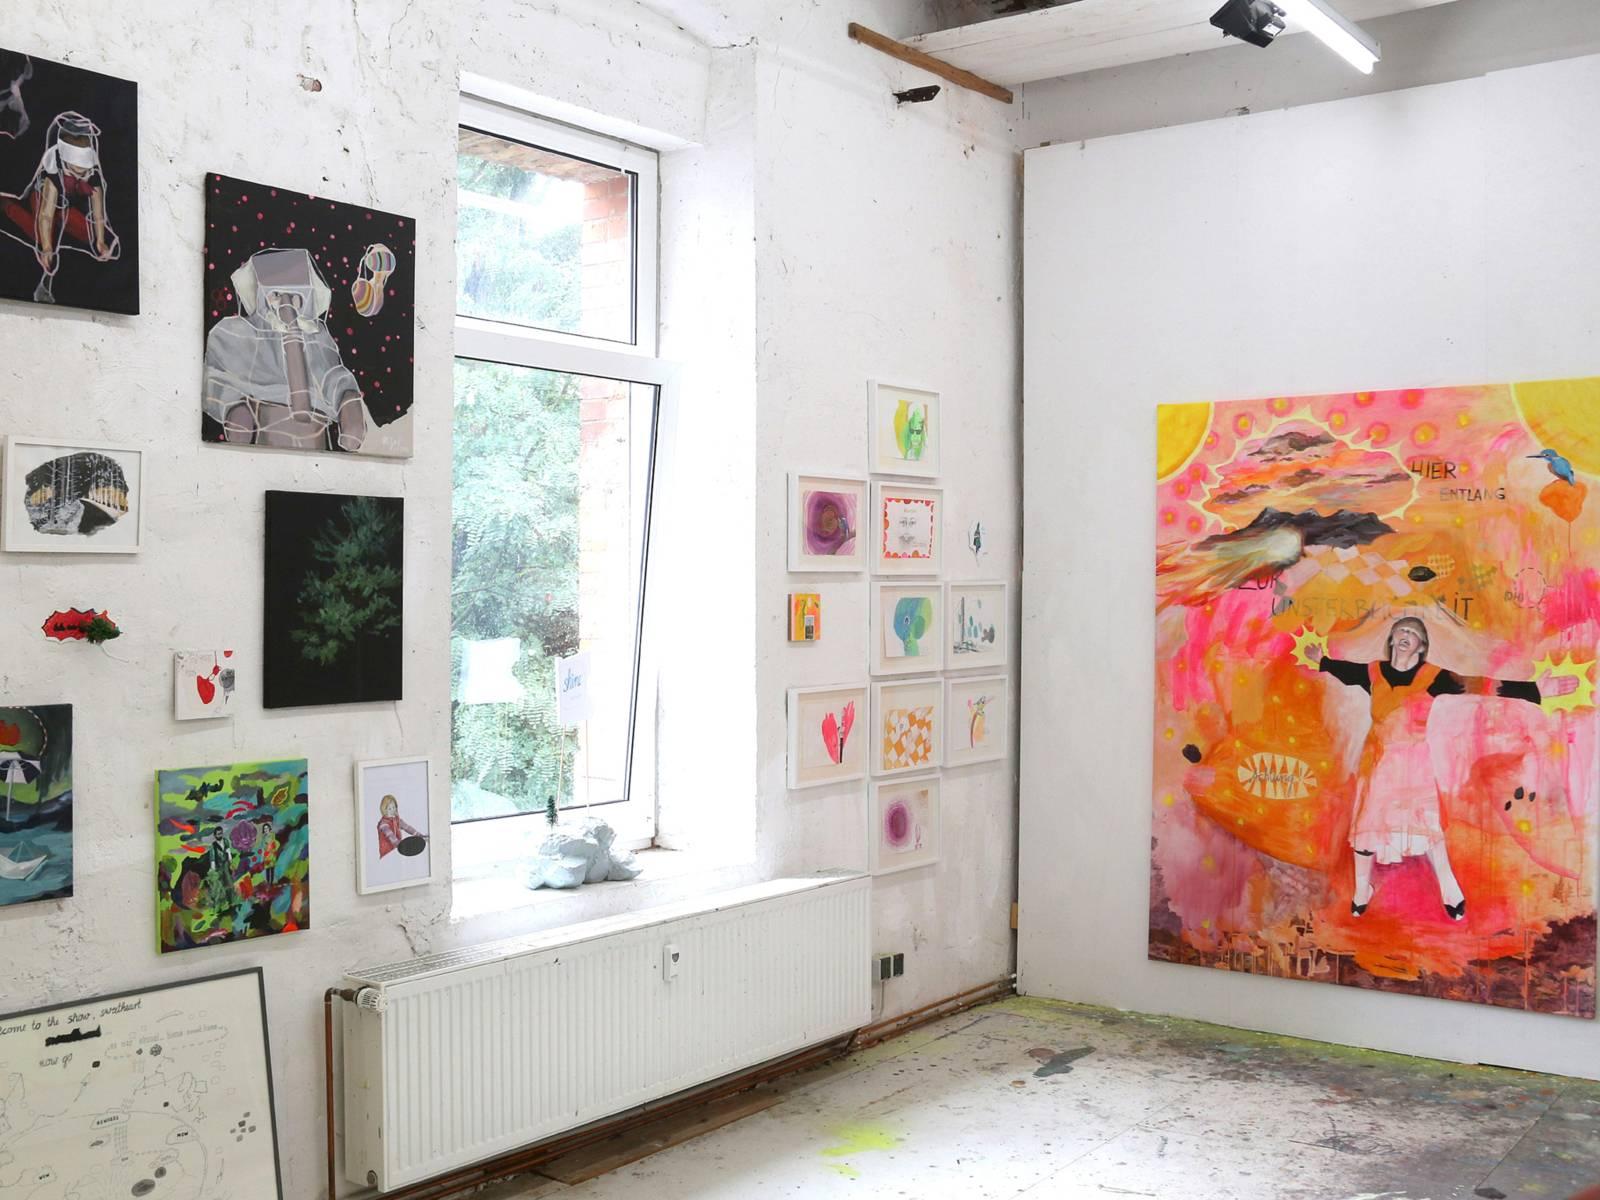 Kunst: Meike Zopf, Ateliers der Eisfabrik